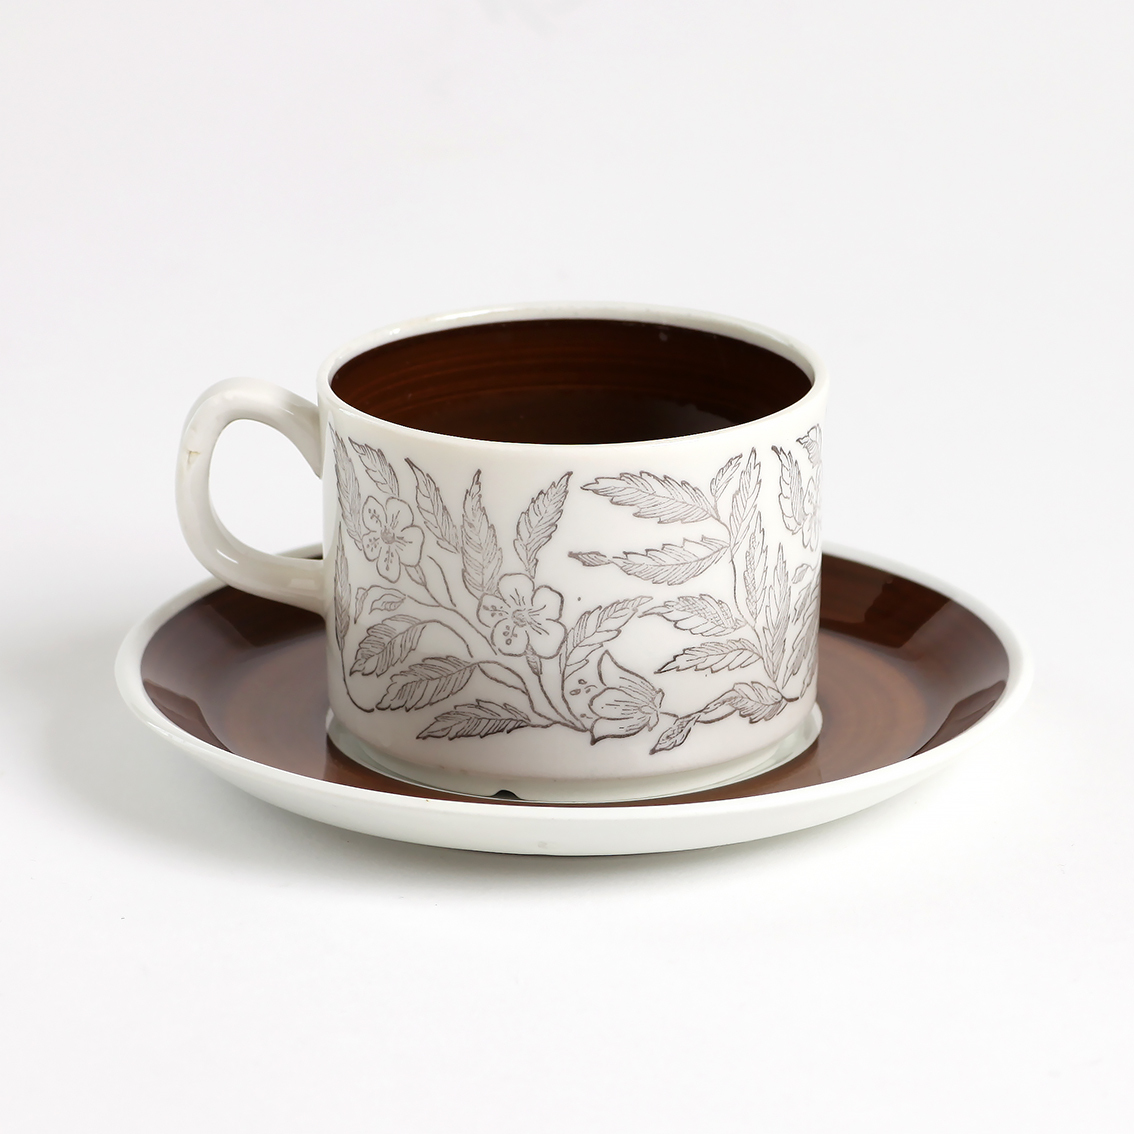 GEFLE ゲフレ Fontana フォンタナ コーヒーカップ&ソーサー - 7 北欧ヴィンテージ ★わけあり★